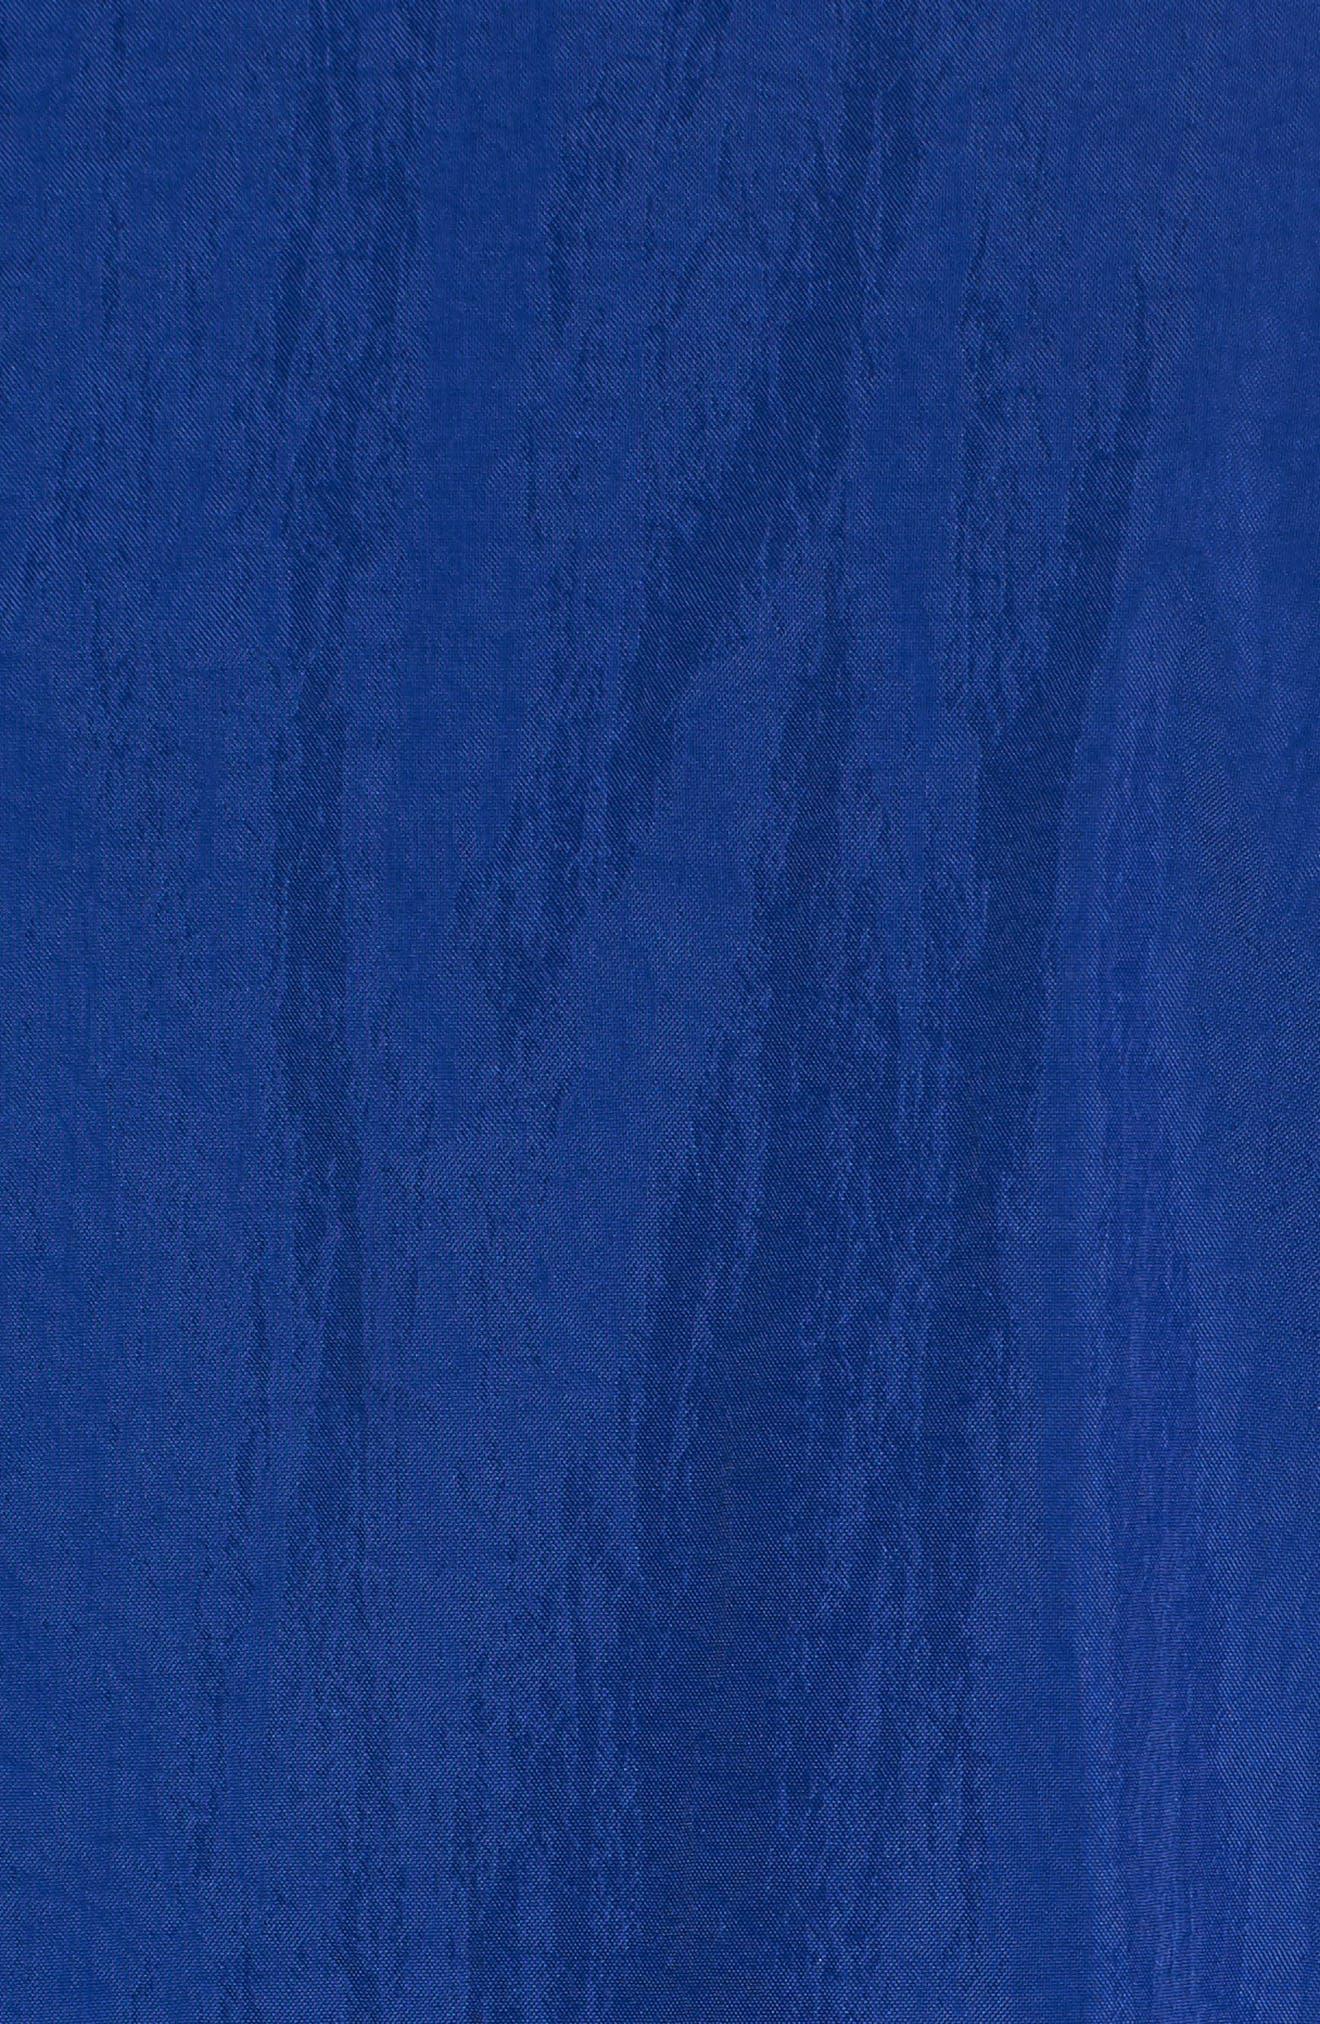 Golden State Warriors Track Jacket,                             Alternate thumbnail 6, color,                             RUSH BLUE/ AMARILLO/ WHITE